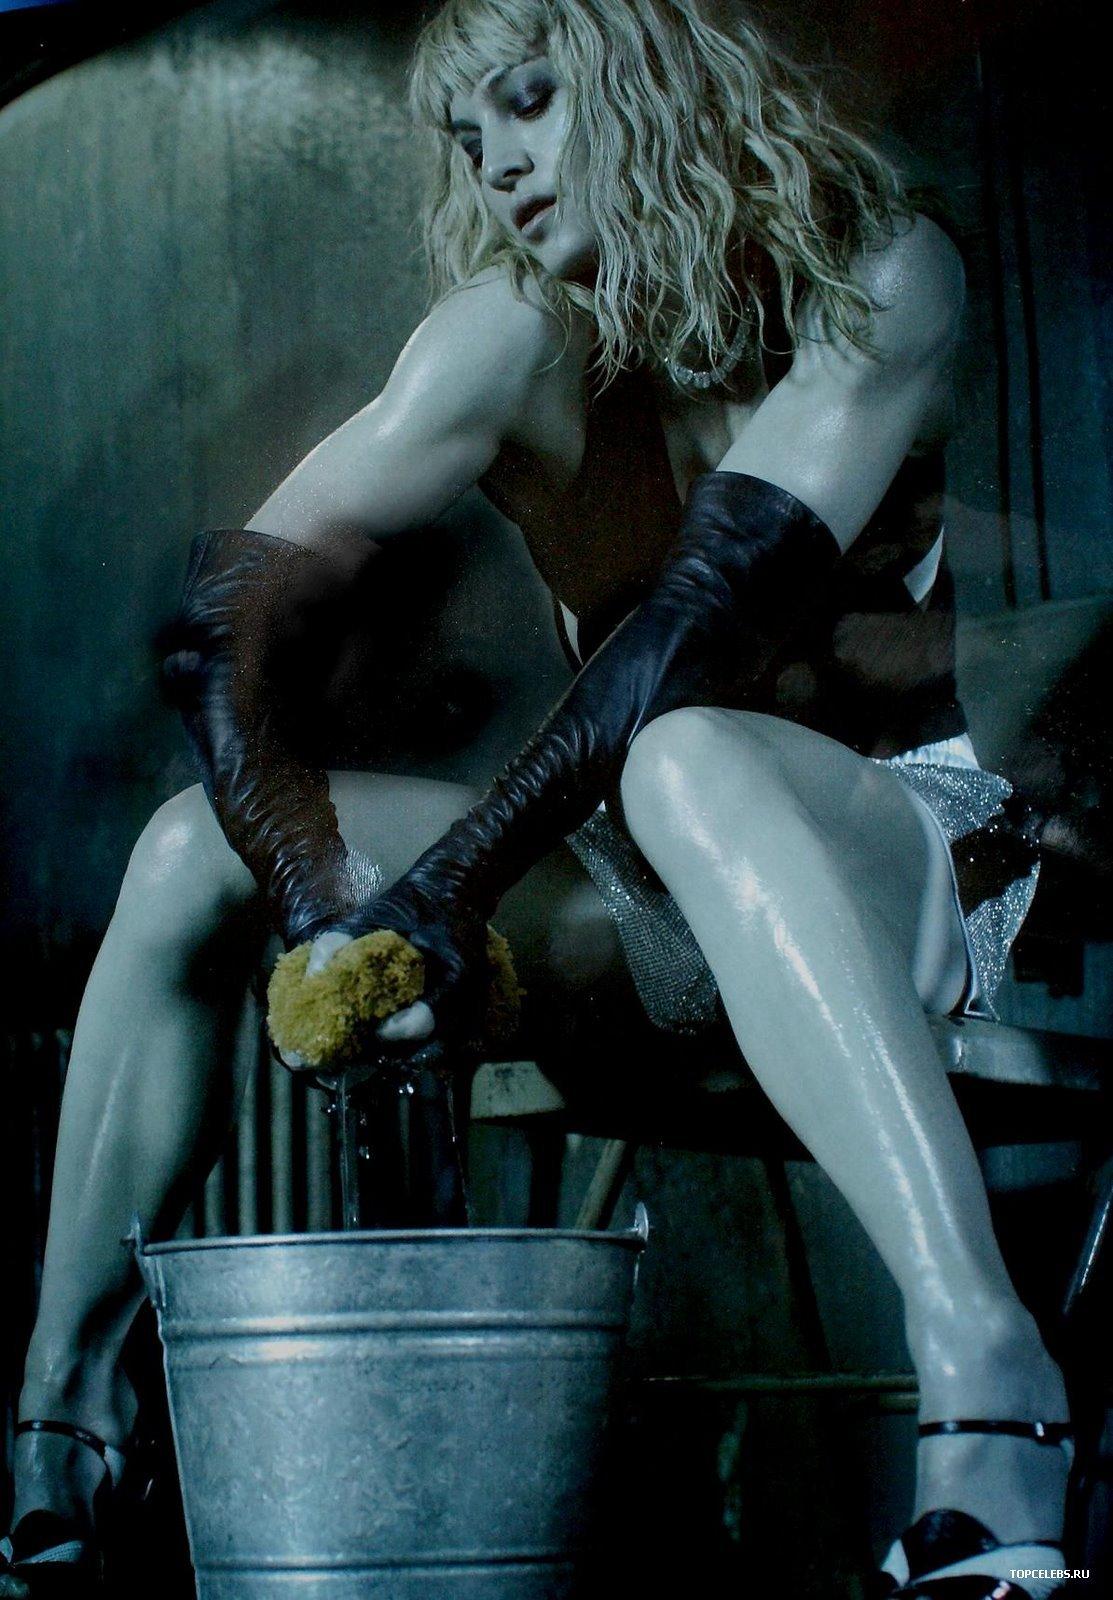 foto-lera-kudryavtseva-erotika